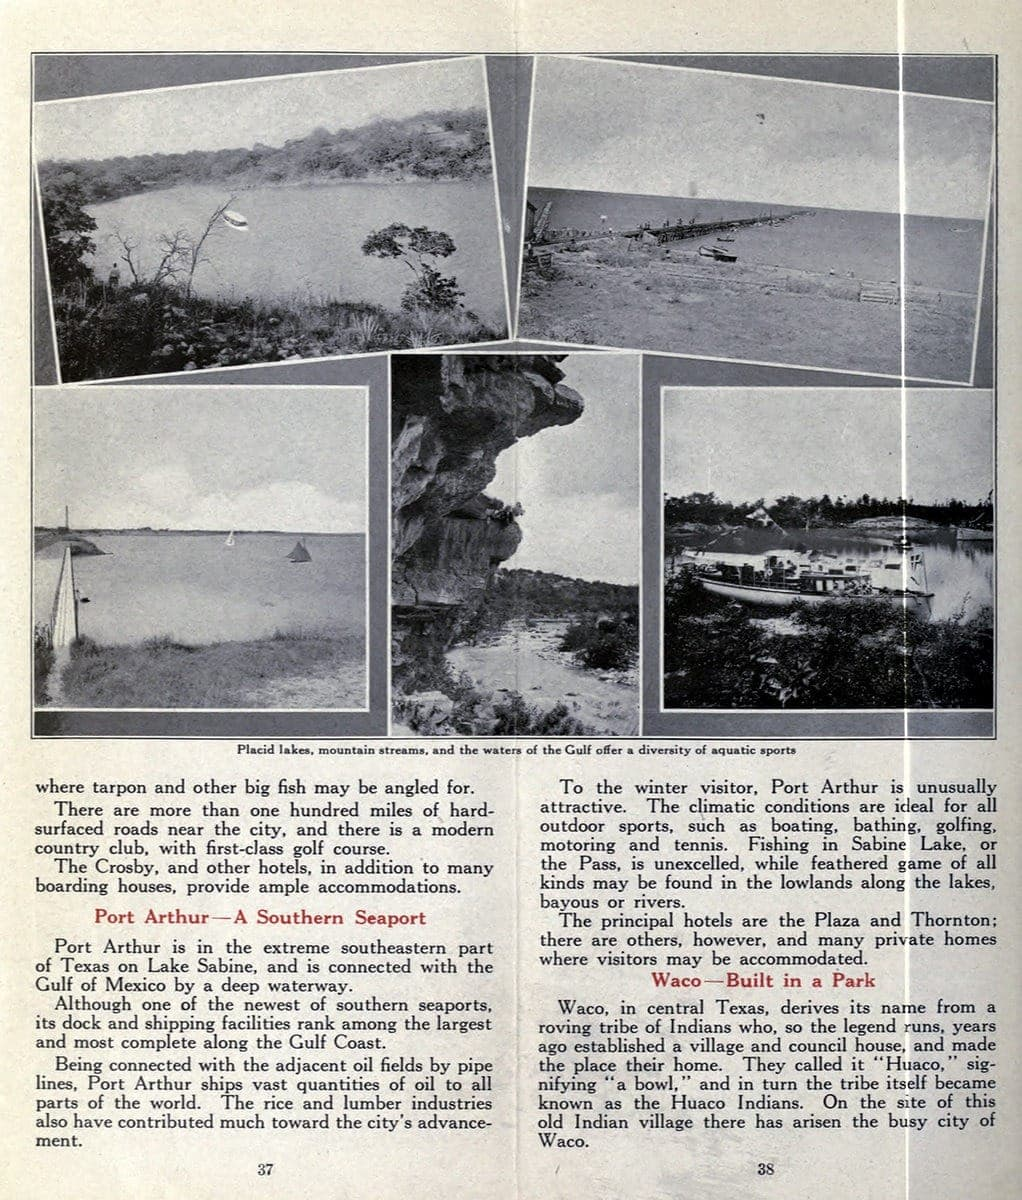 Port Arthur & Waco